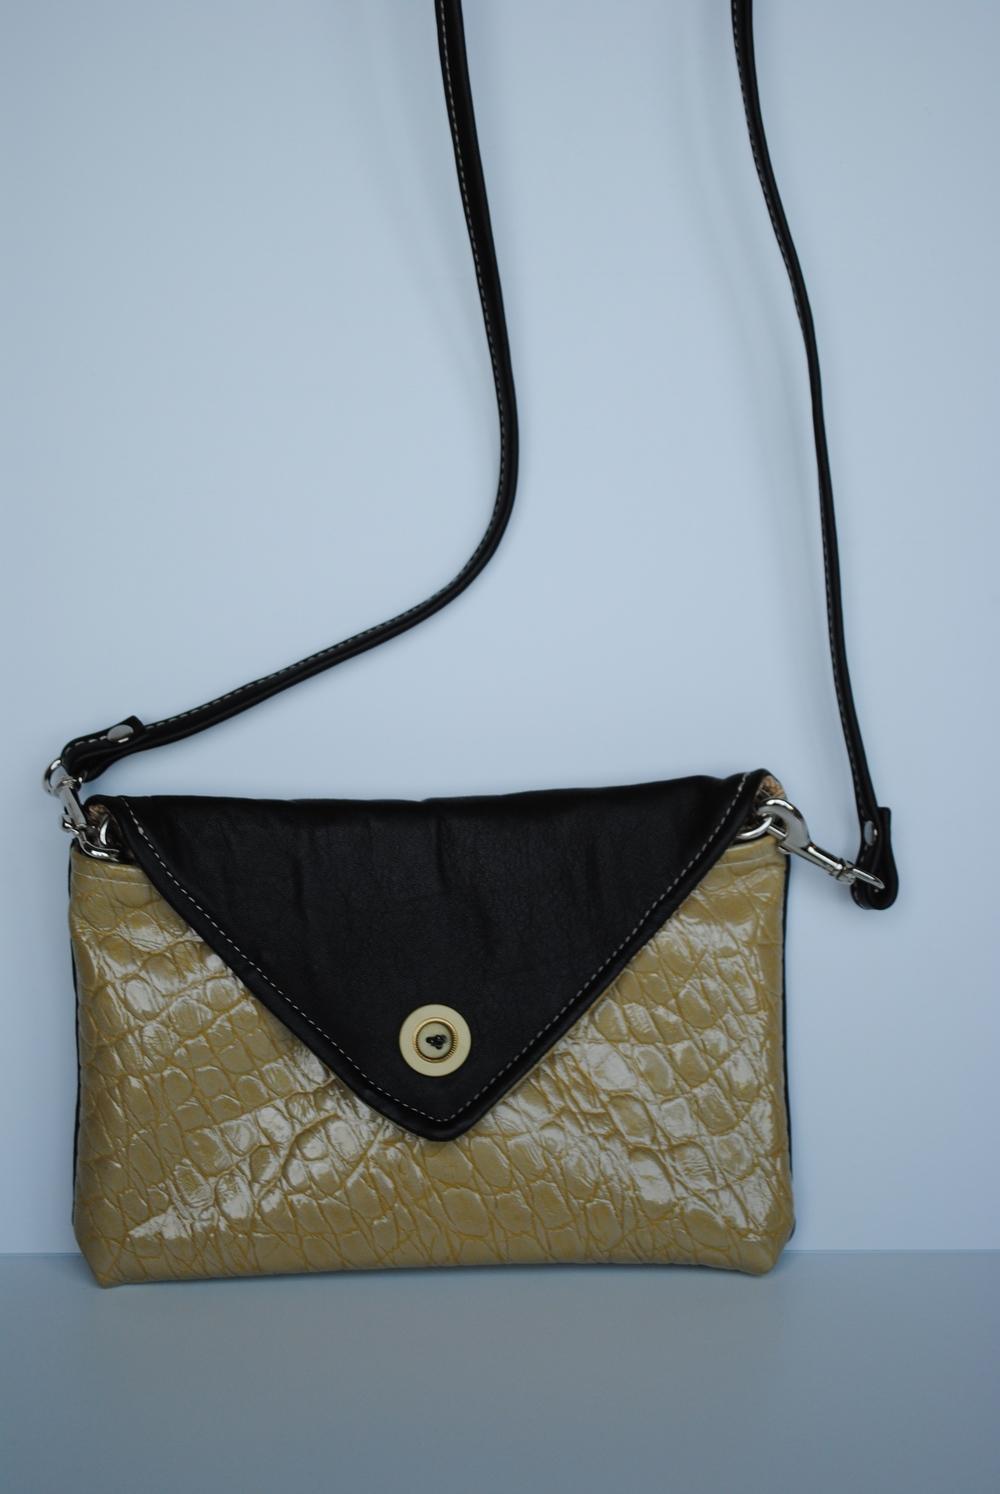 Zaitun All Leather Envelope Clutch Or Shoulder Bag